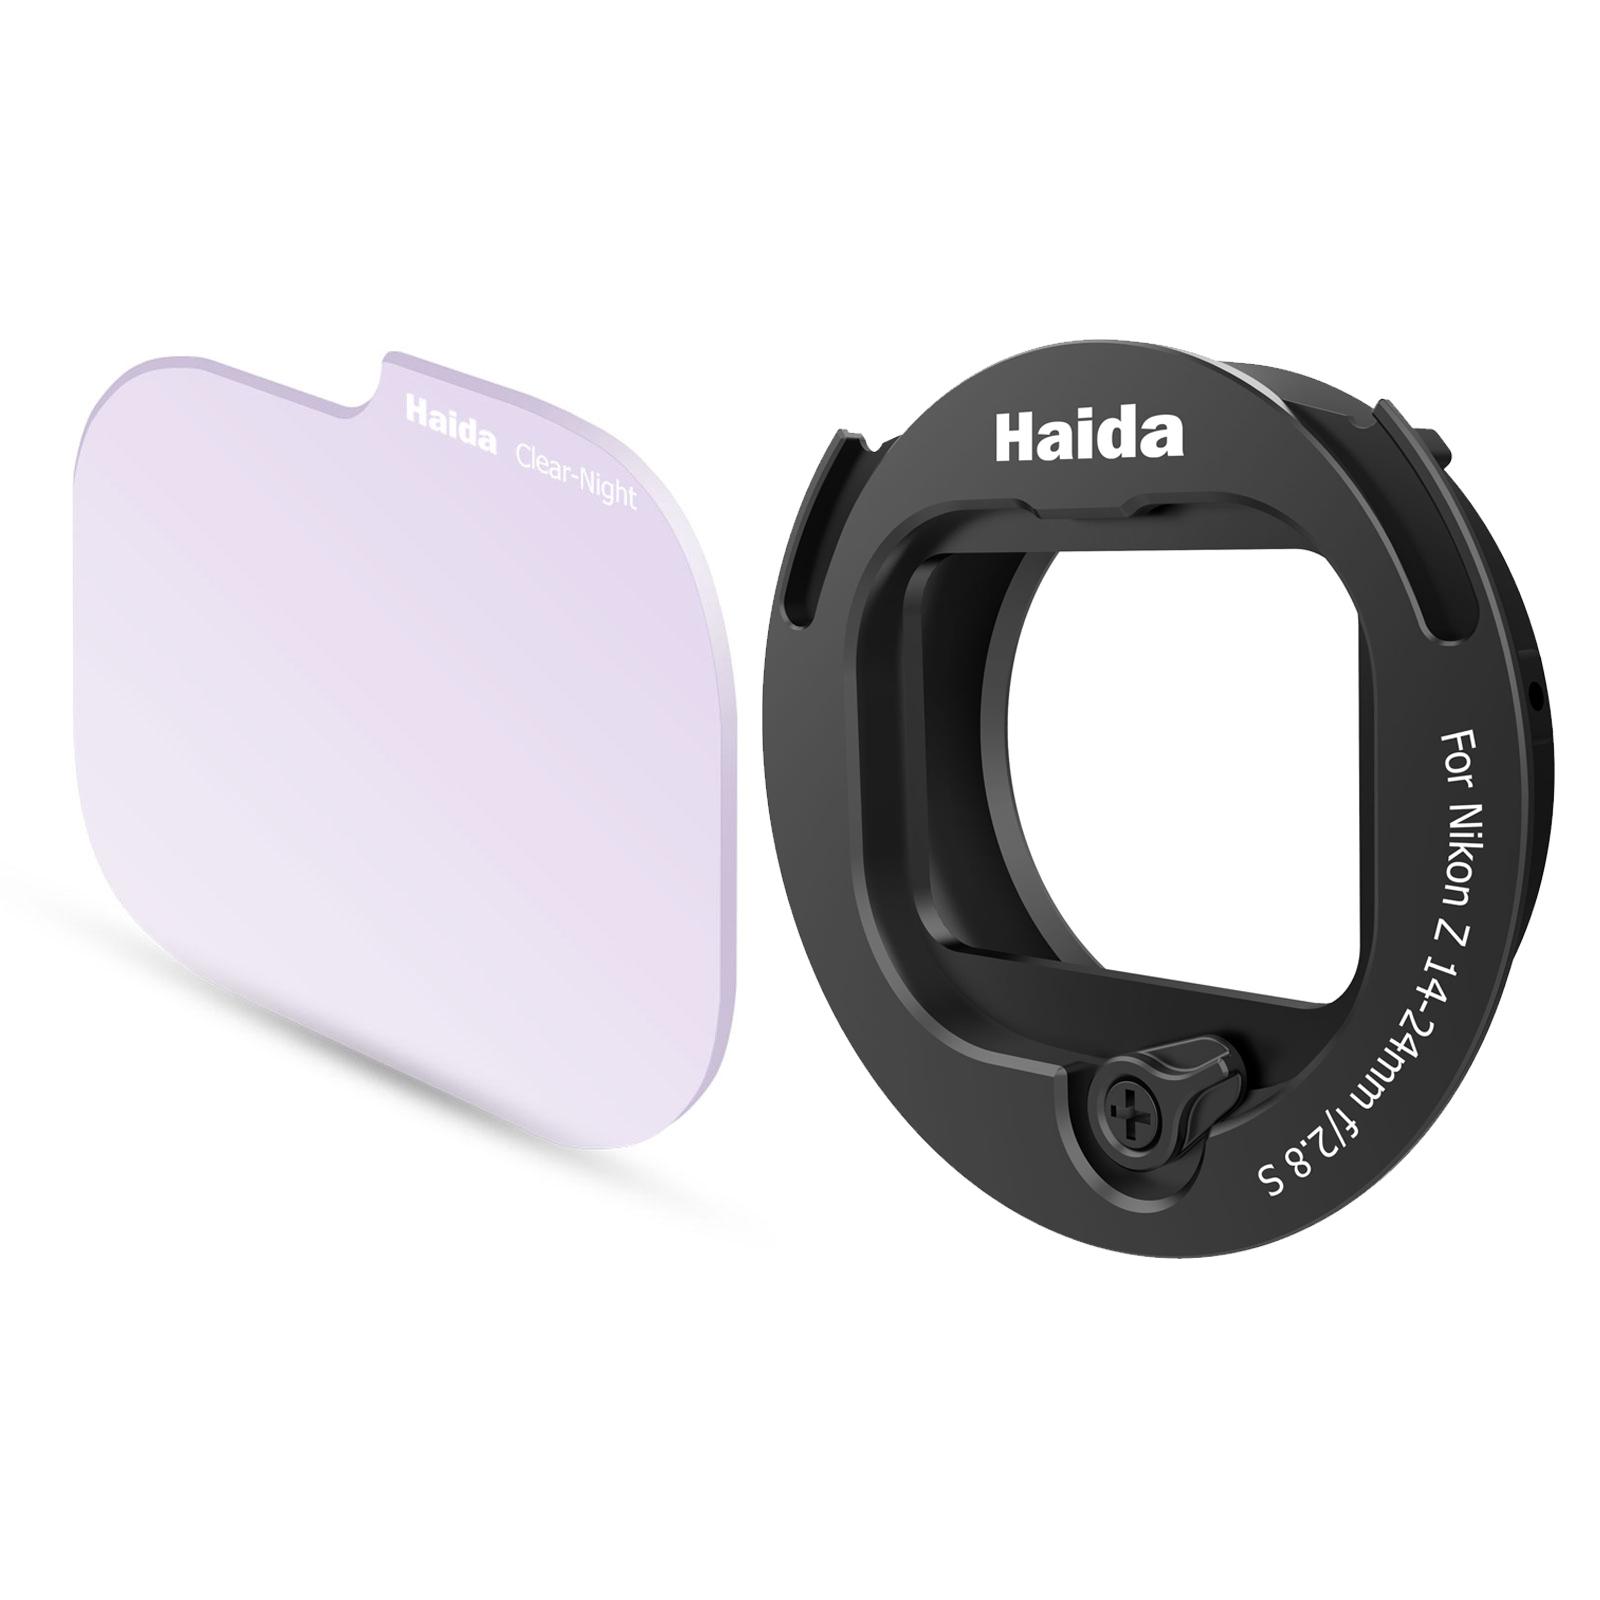 Haida-Rear-Lens-Clear-Night-Nikon-Z-Adapter-Ring